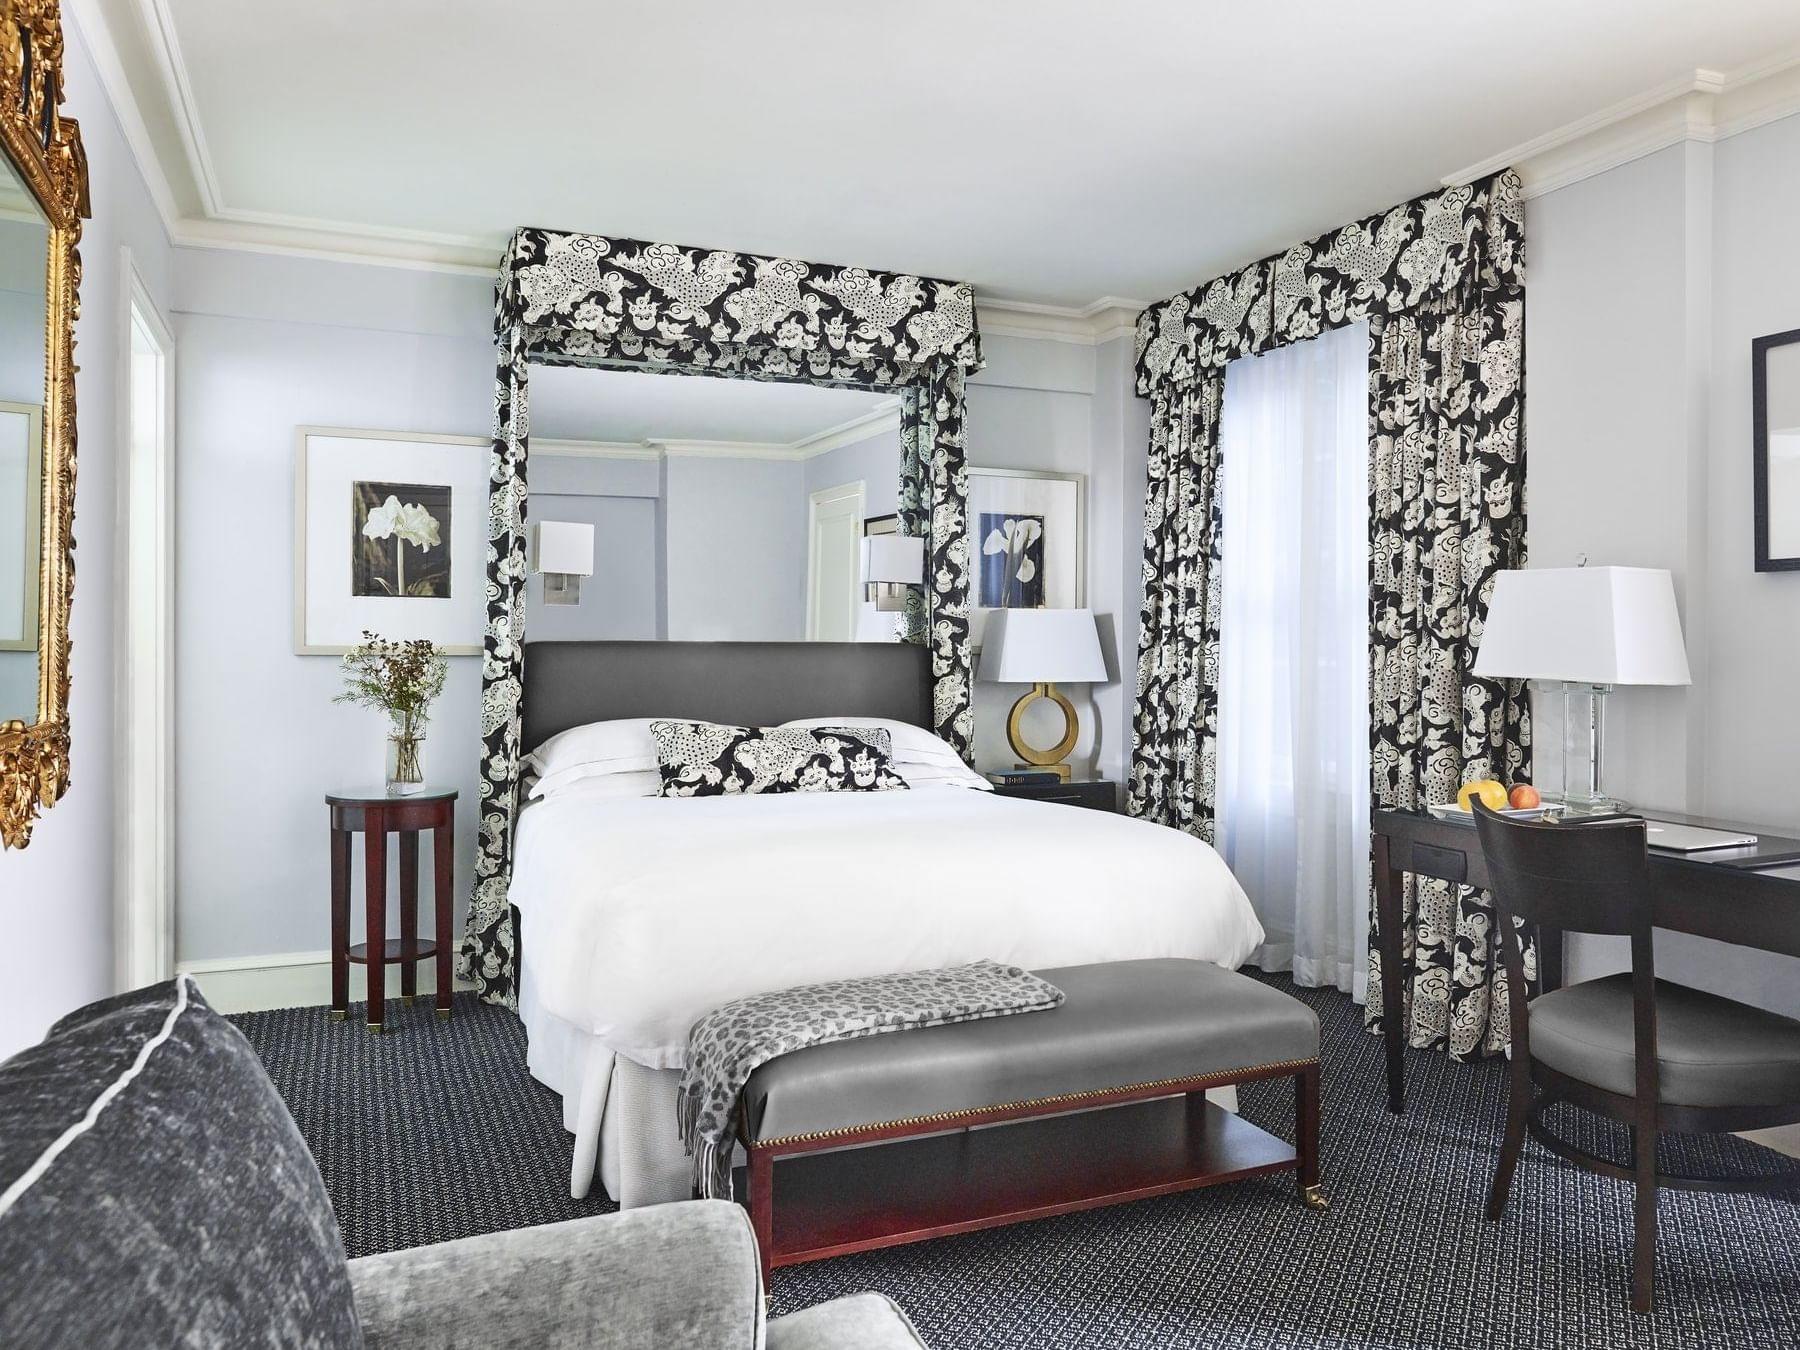 Deluxe Double Guestroom with one queen bed